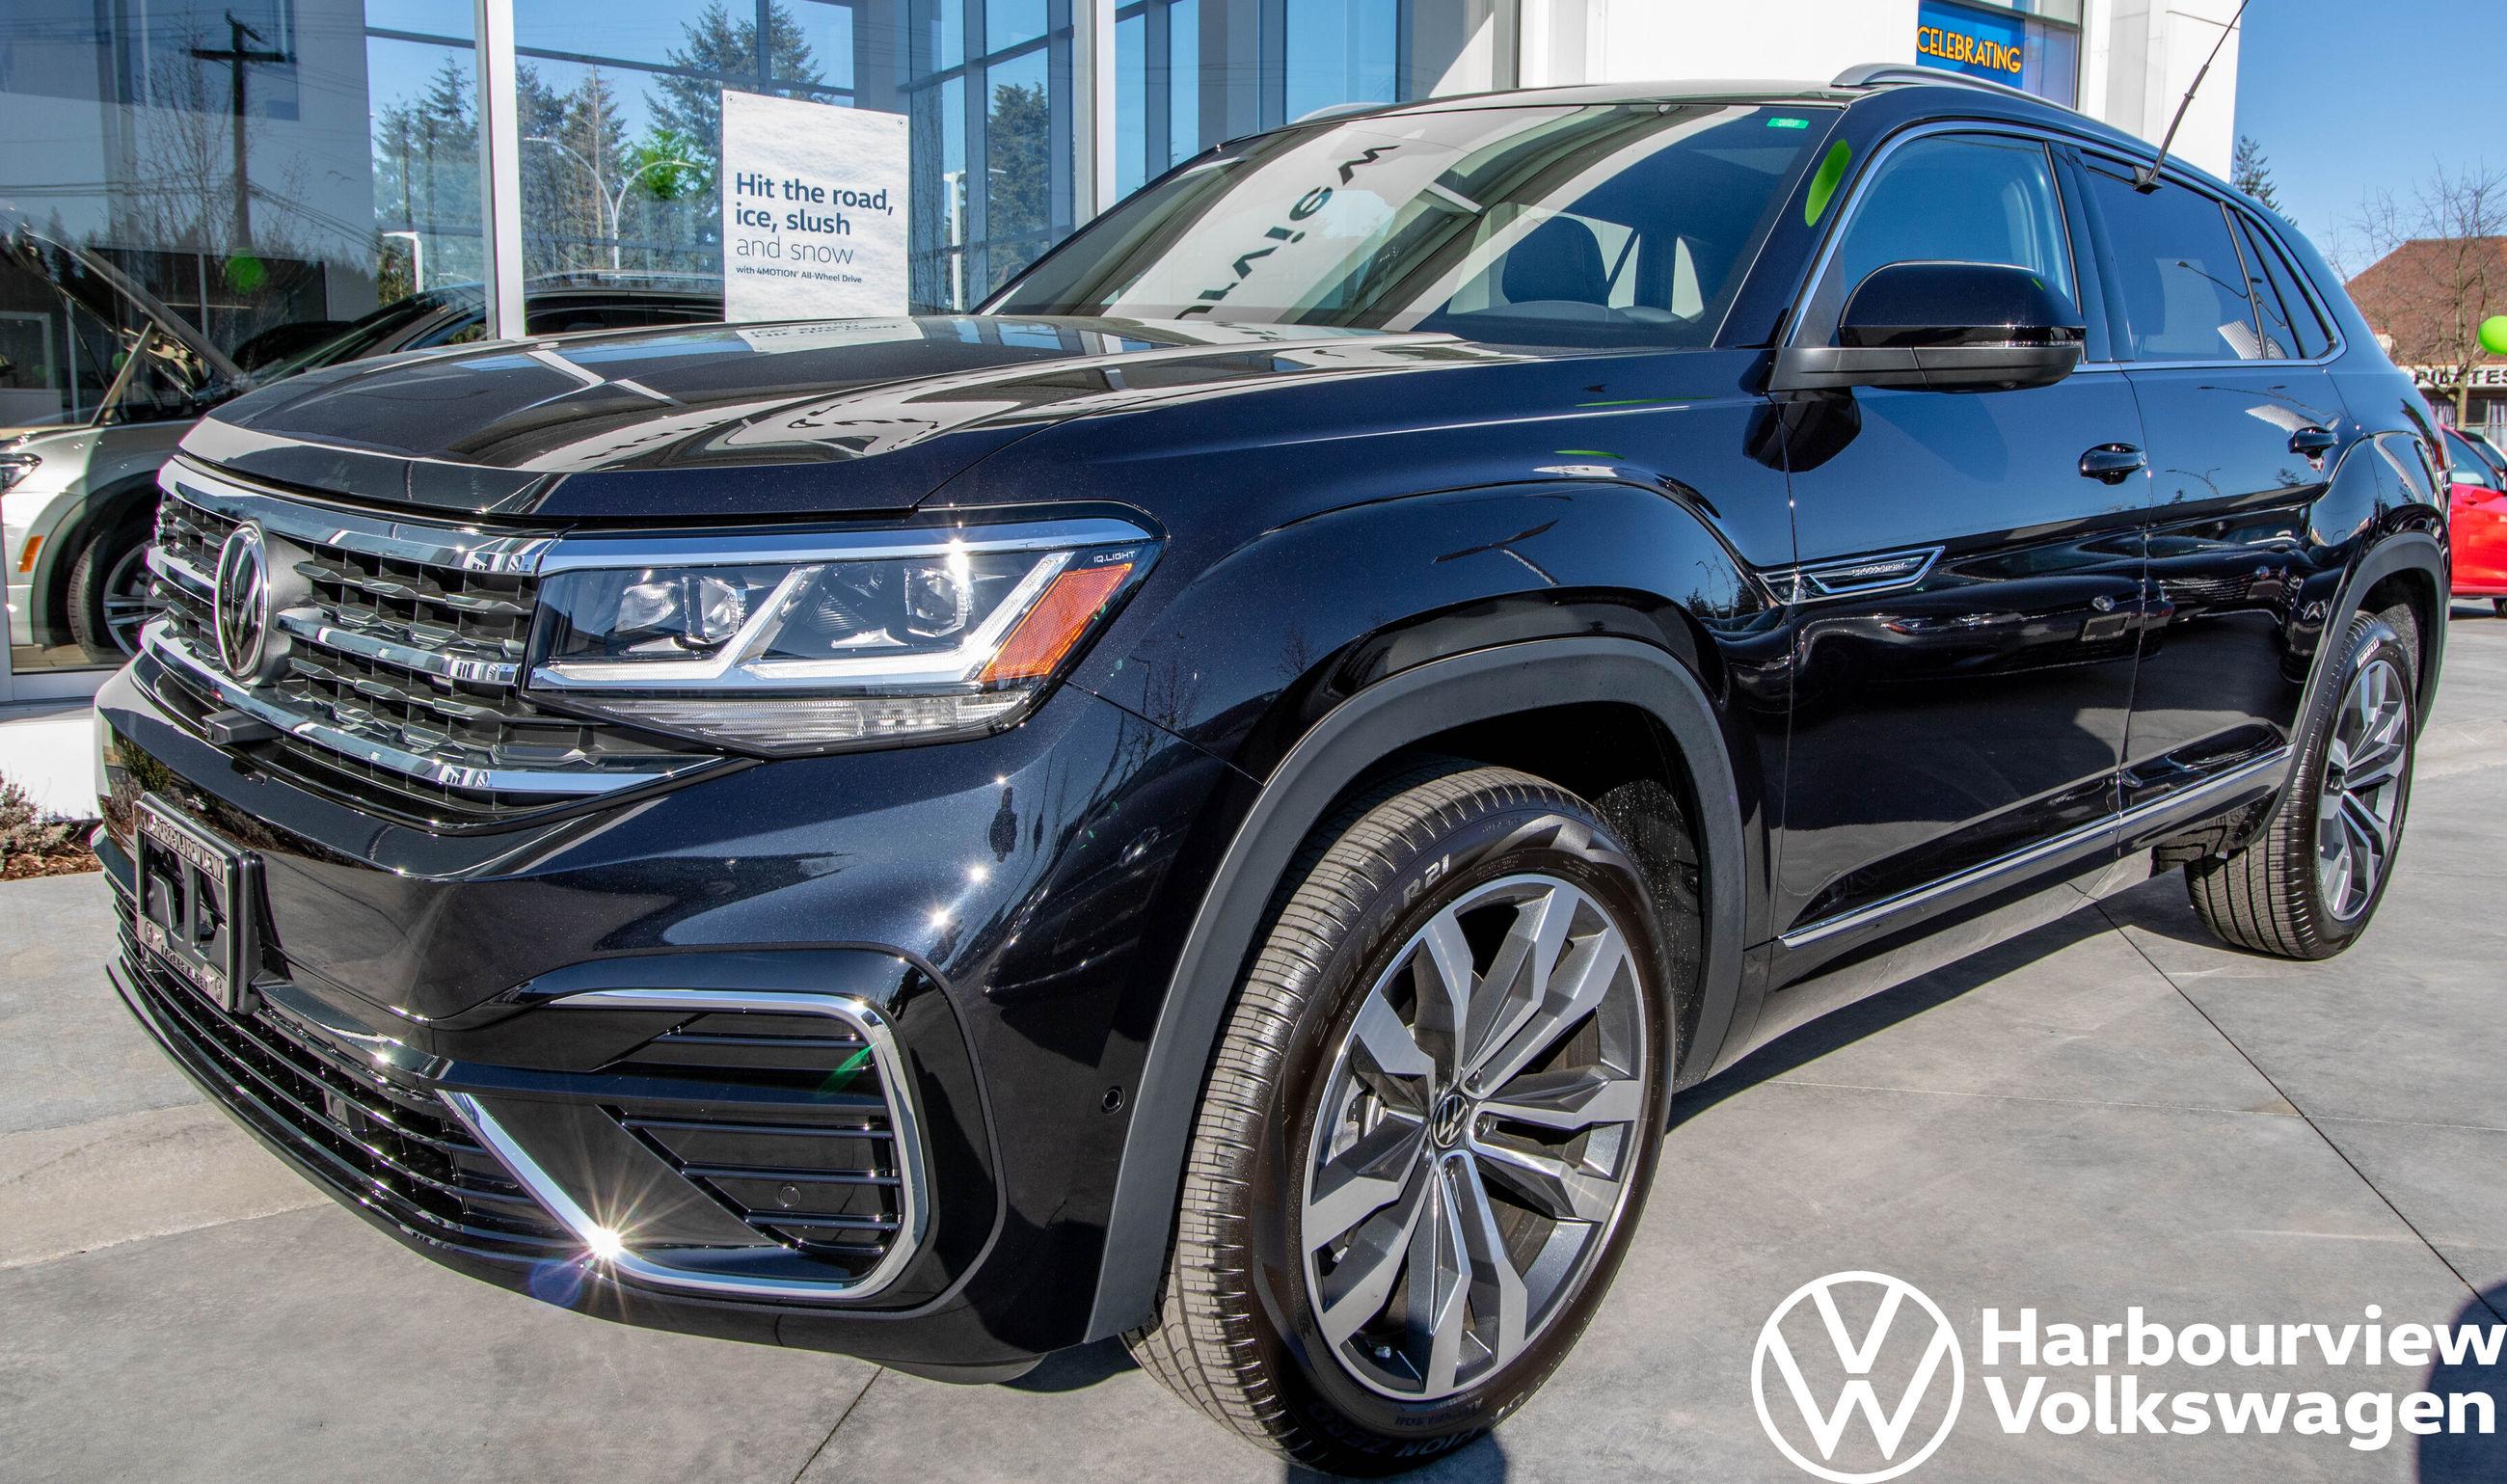 New 2020 Volkswagen Atlas Cross Sport Execline 3 6l W R Line Advanced Driver Asst Pk For Sale 59065 Harbourview Vw